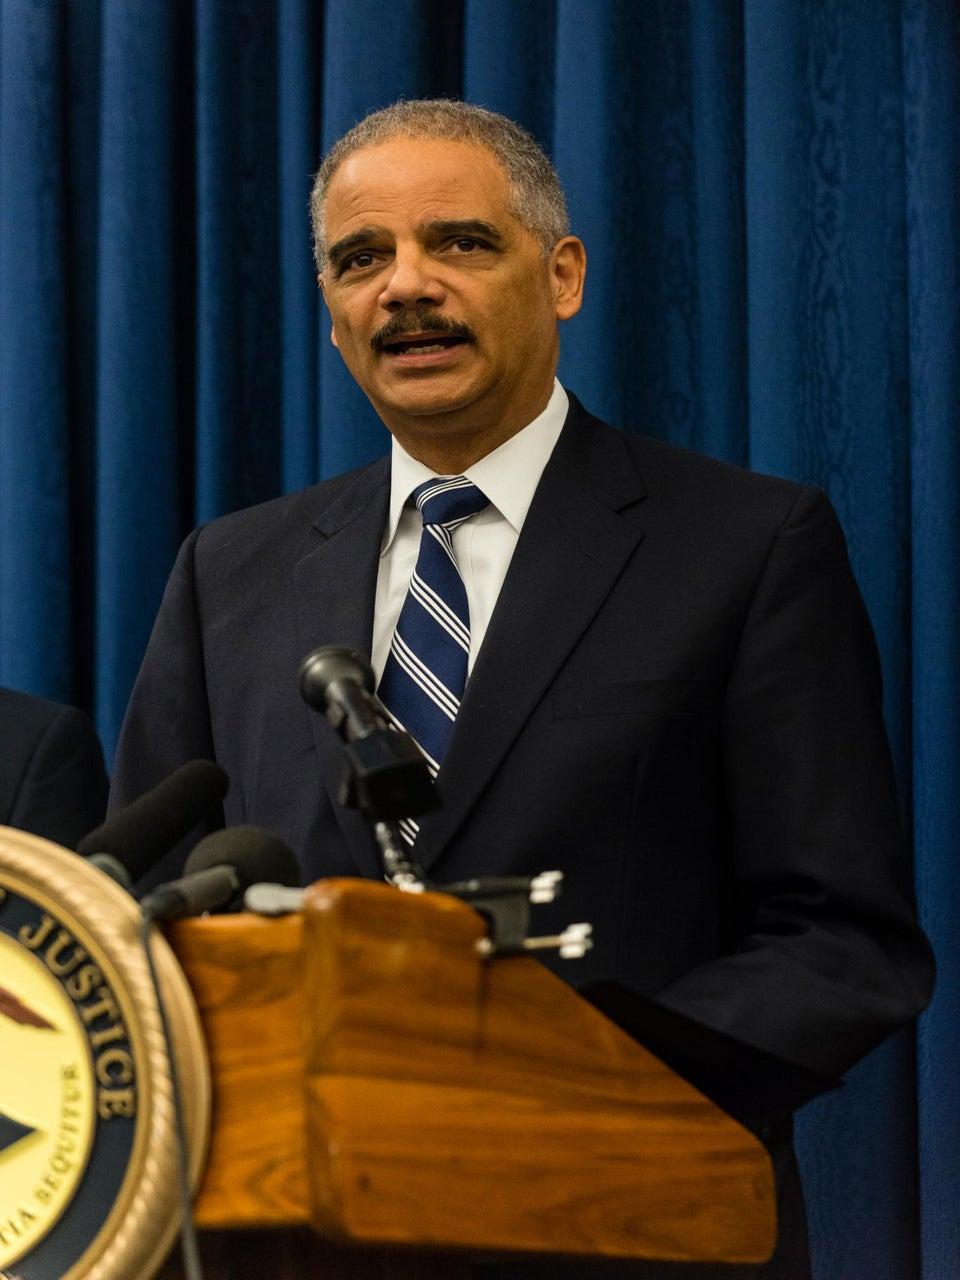 Prosecutors Seeking Fewer Mandatory Minimum Sentences Against Drug Offenders